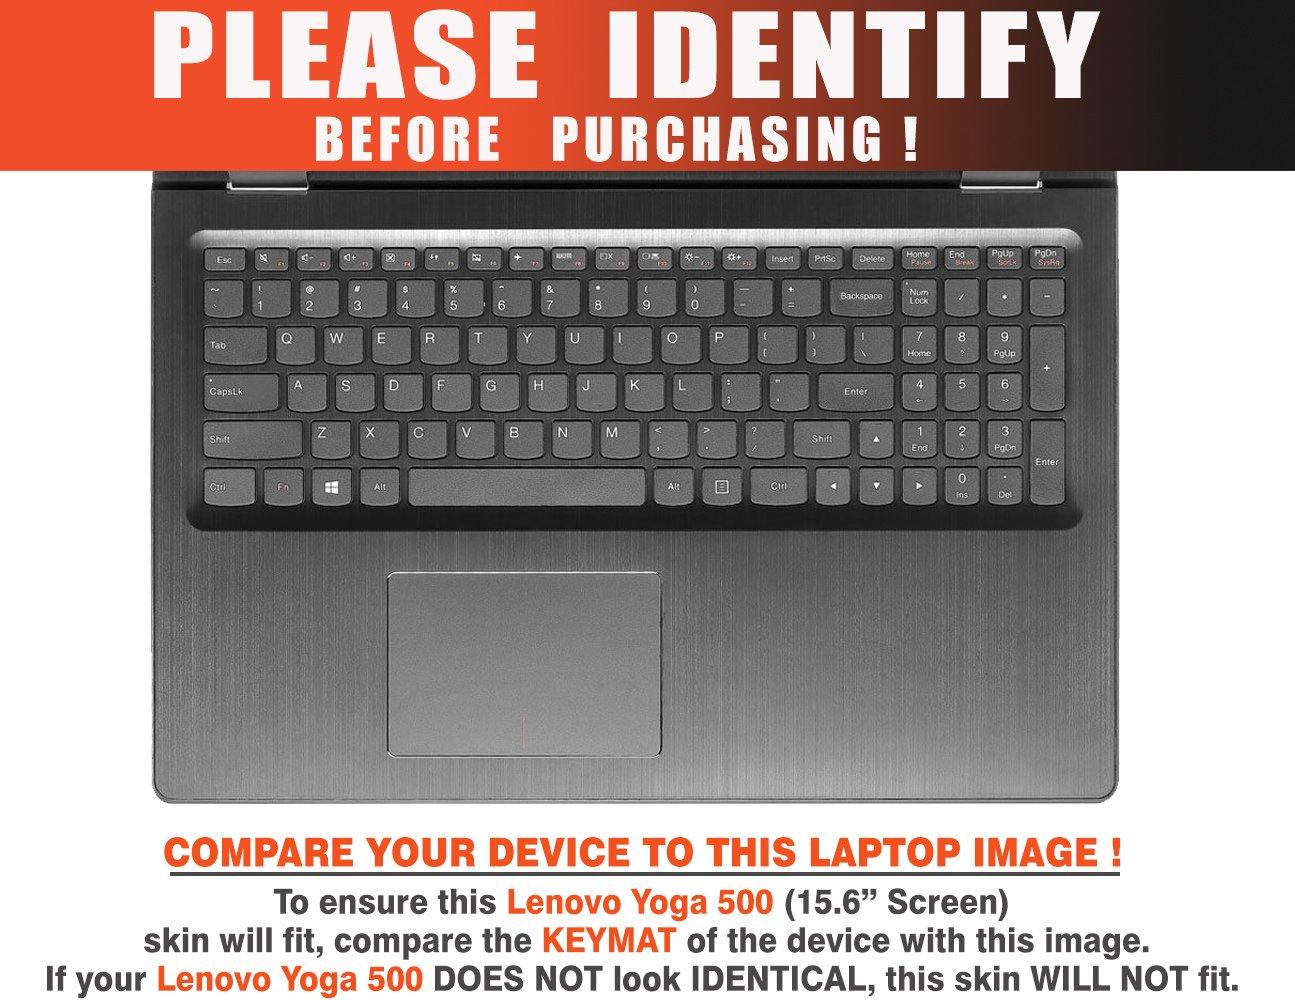 Amazon.com: Decalrus - Protective decal for Lenovo Yoga 500 ...